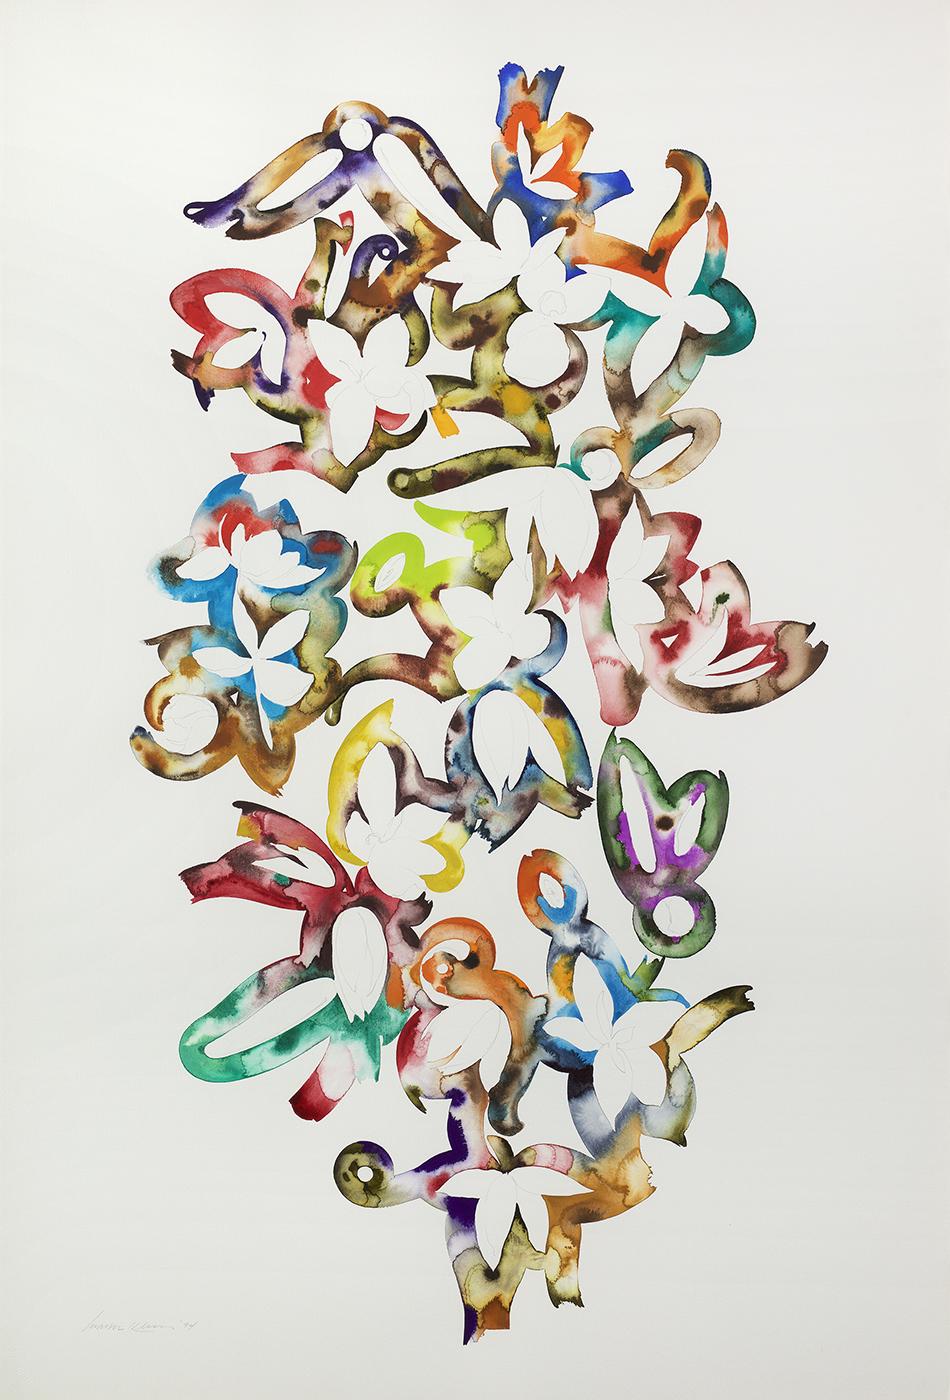 Martin Kline  , Figure , 1994, Pencil, watercolor and gouache on paper, 60 x 40 1/4 inches